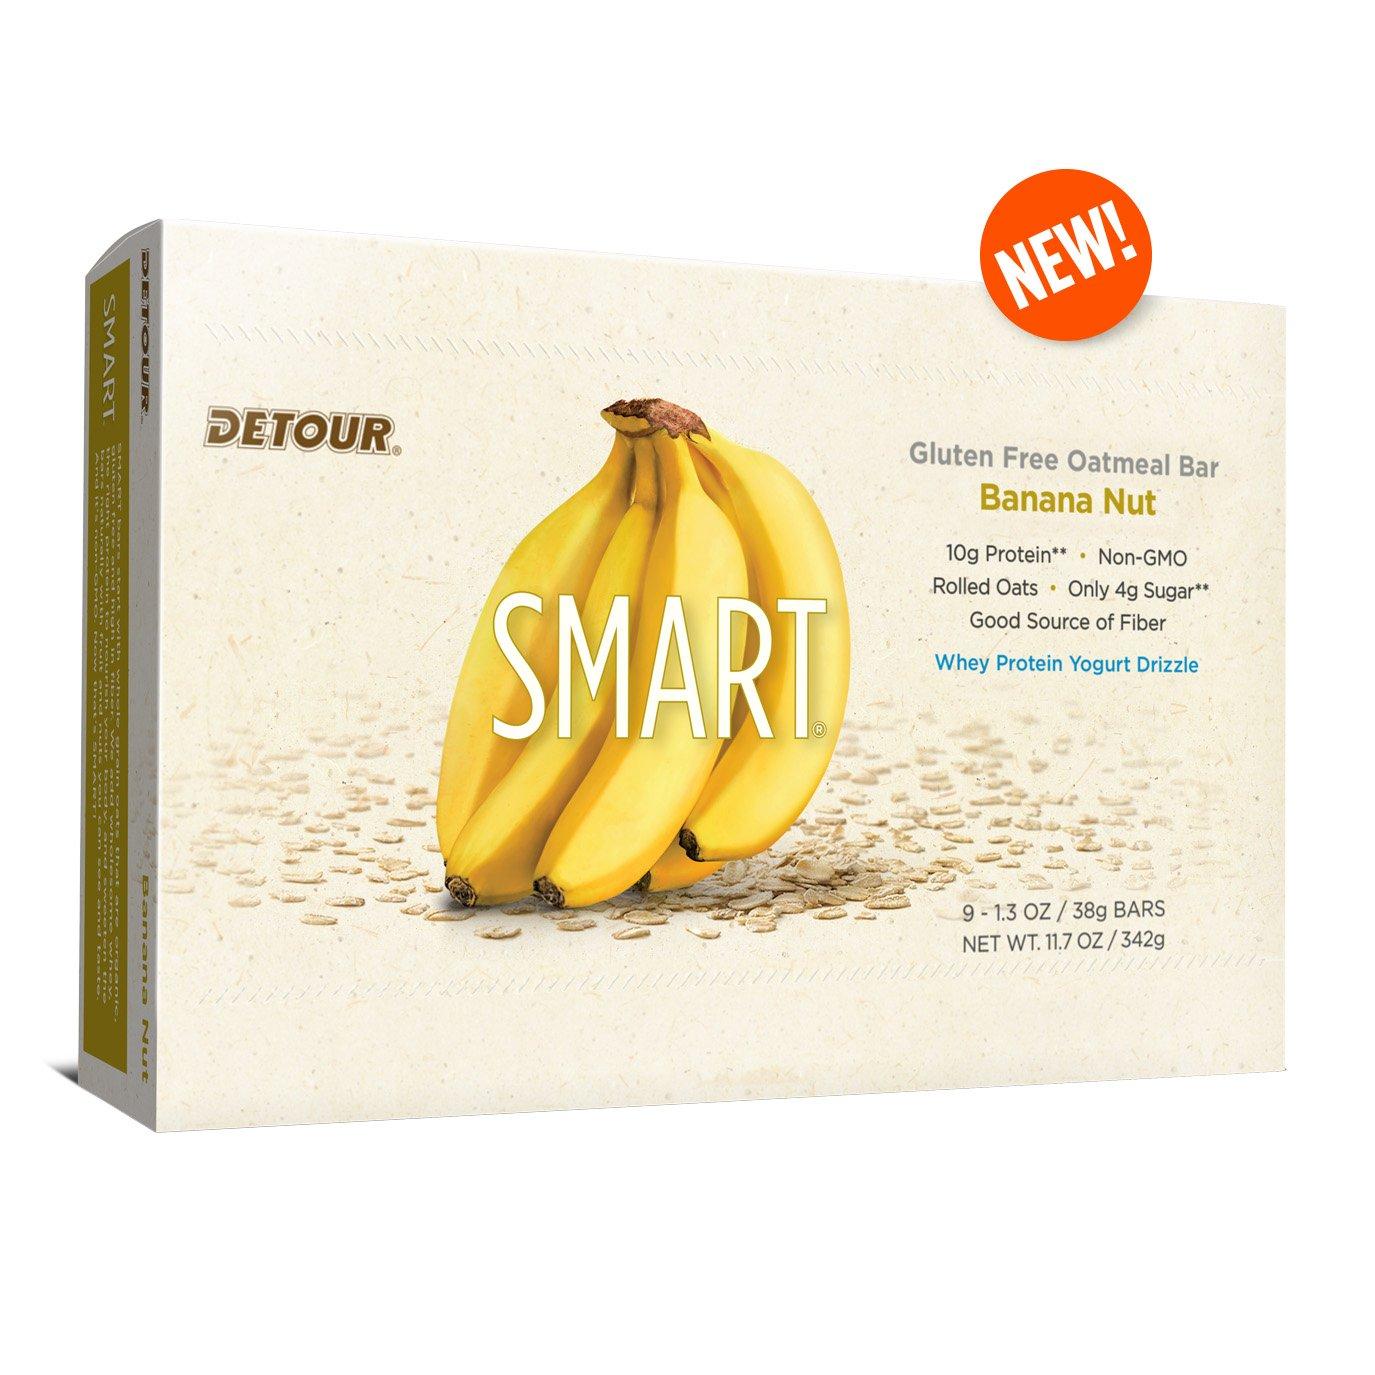 Detour Smart Gluten Free Oatmeal Bar, Banana Nut, 11.7 Ounce, (Pack of 9)